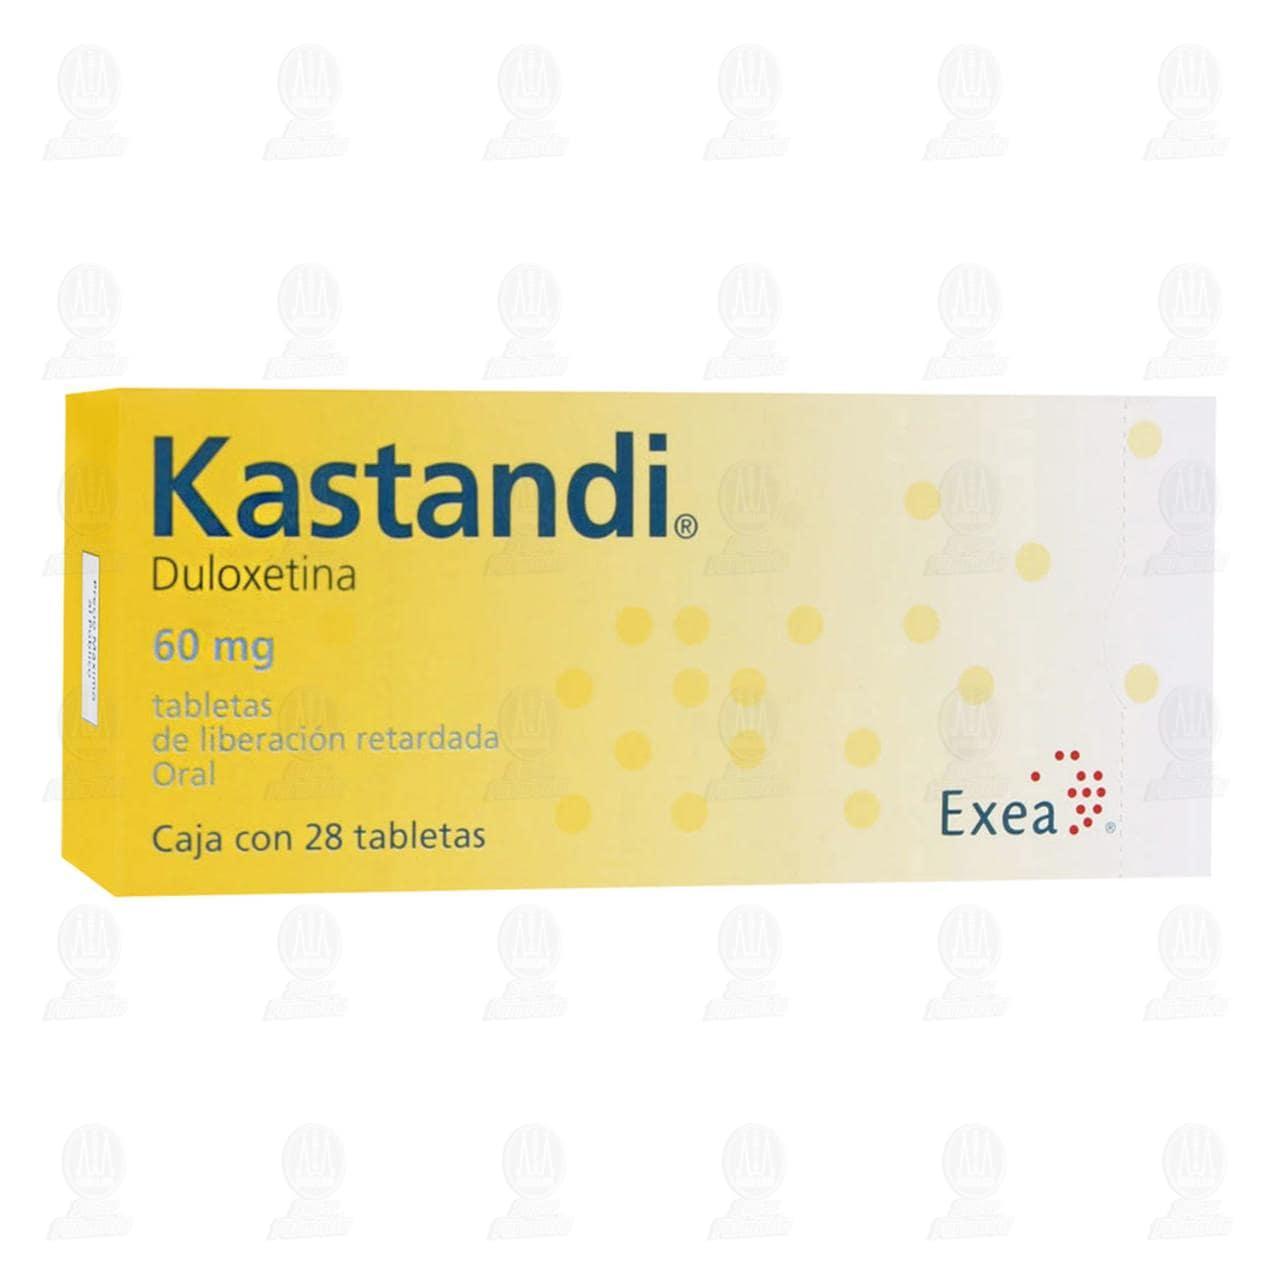 Comprar Kastandi 60mg 28 Tabletas en Farmacias Guadalajara